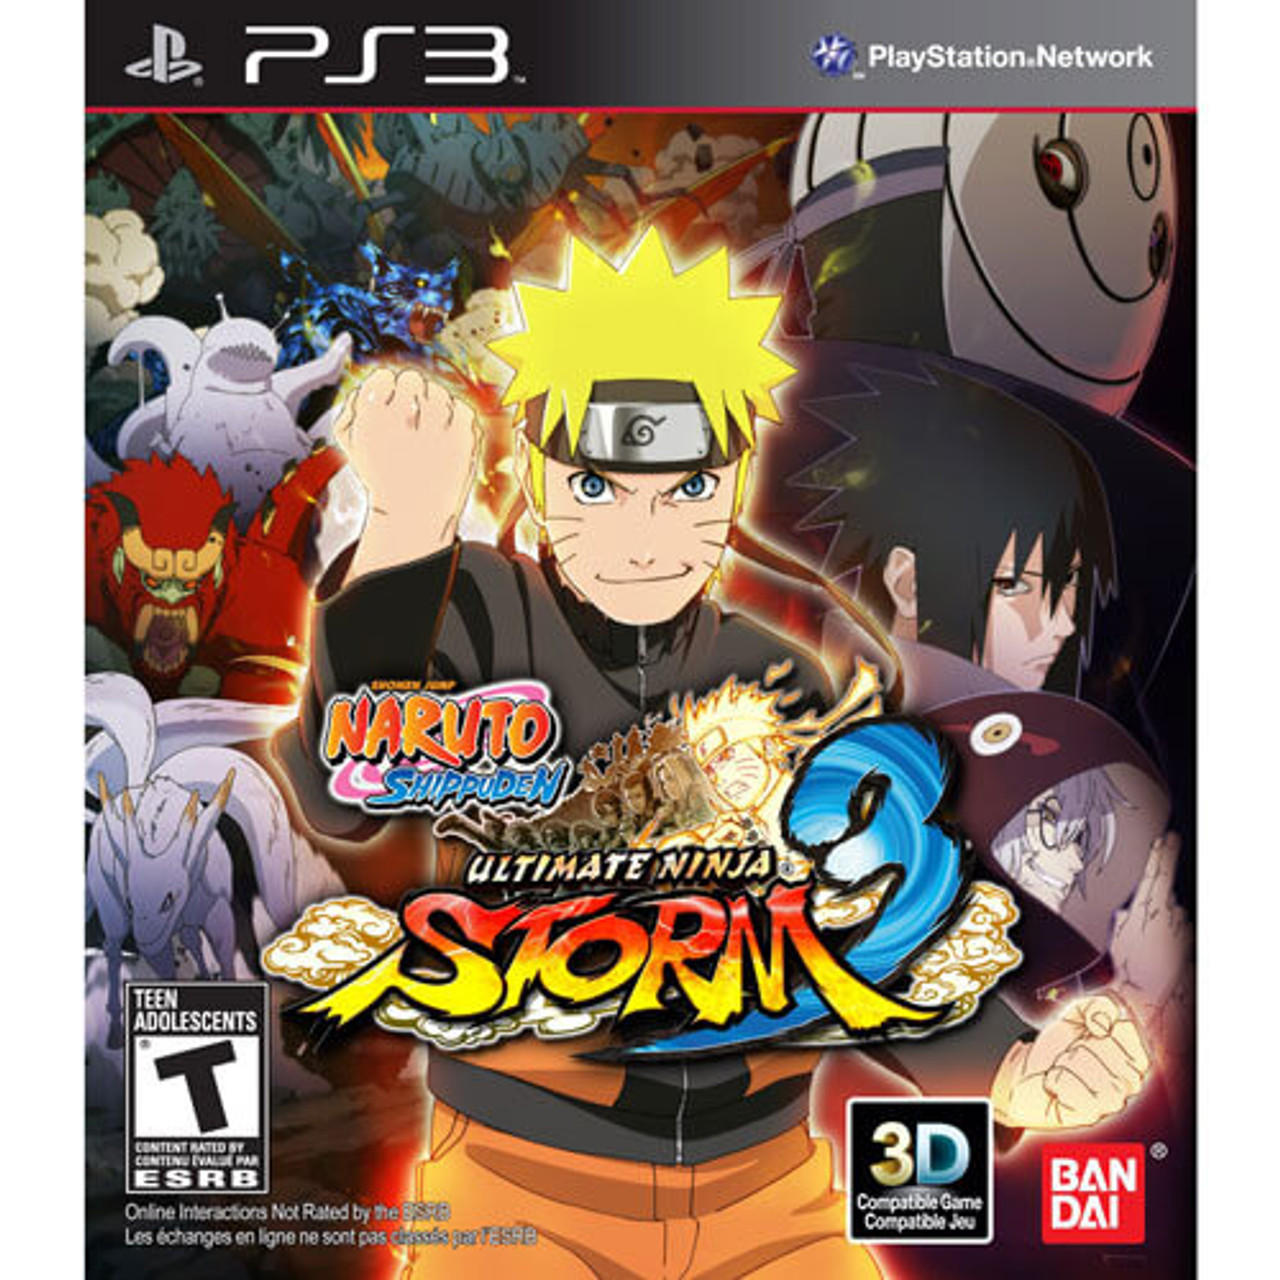 Naruto shippuden ultimate ninja storm 3 playstation 3 ps3 game sale